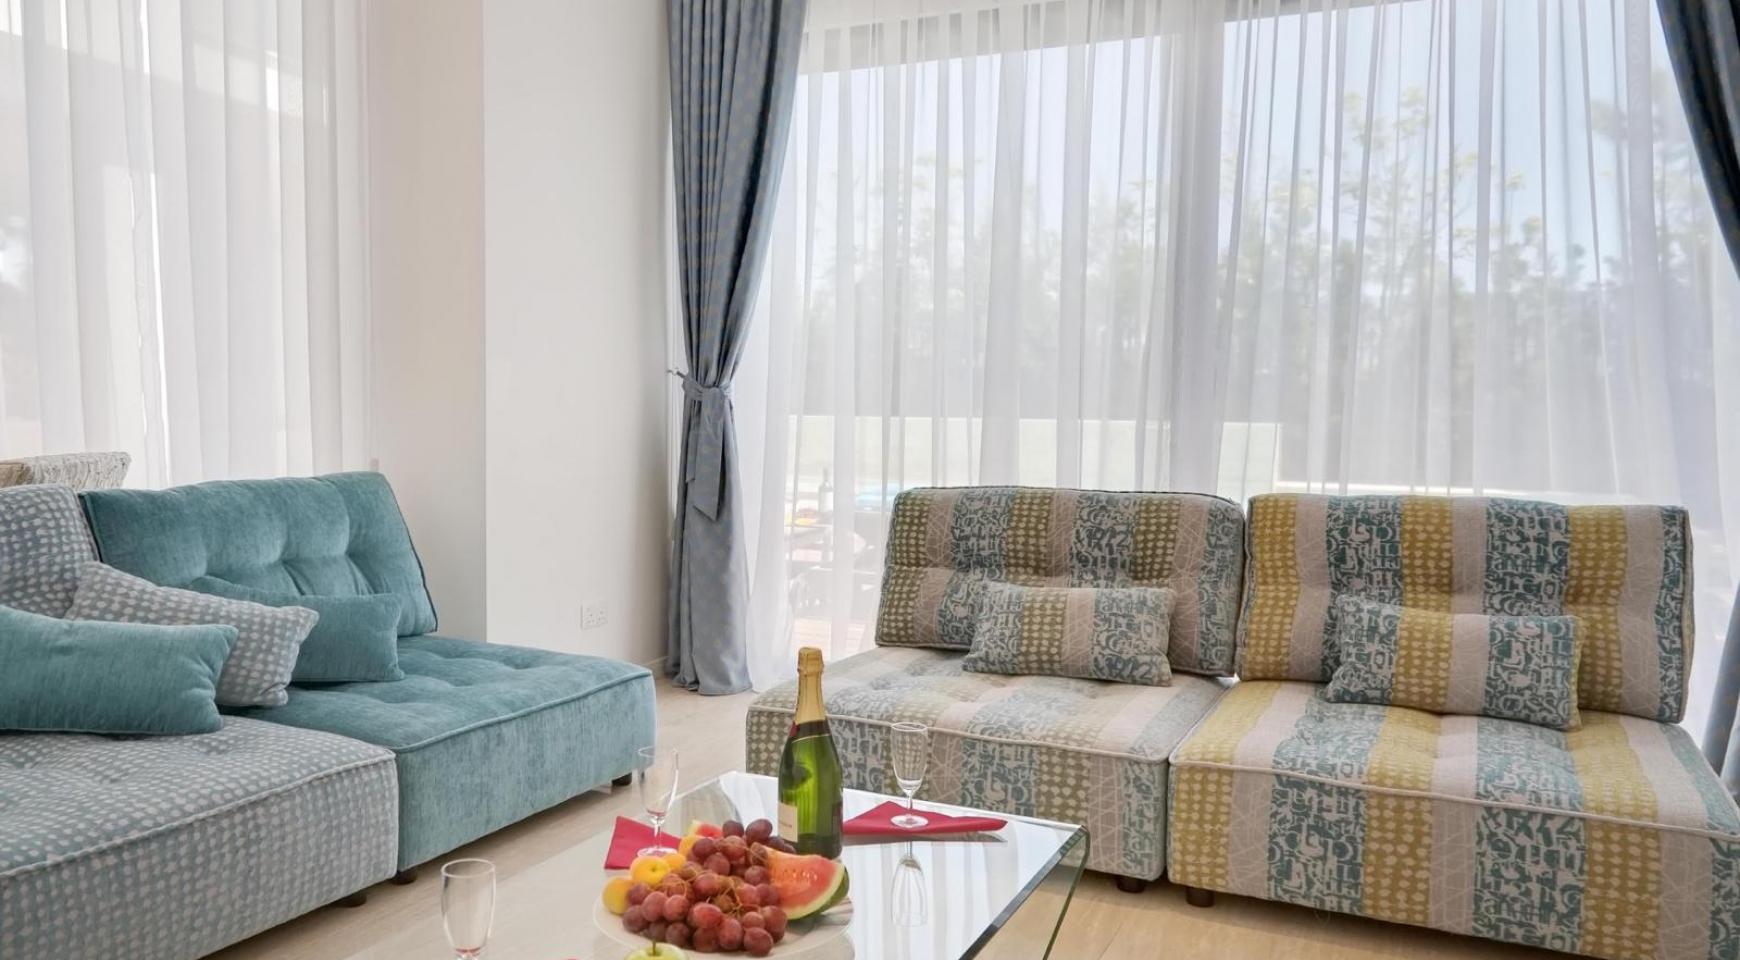 New Luxurious 4 Bedroom Villa in the Tourist Area - 19